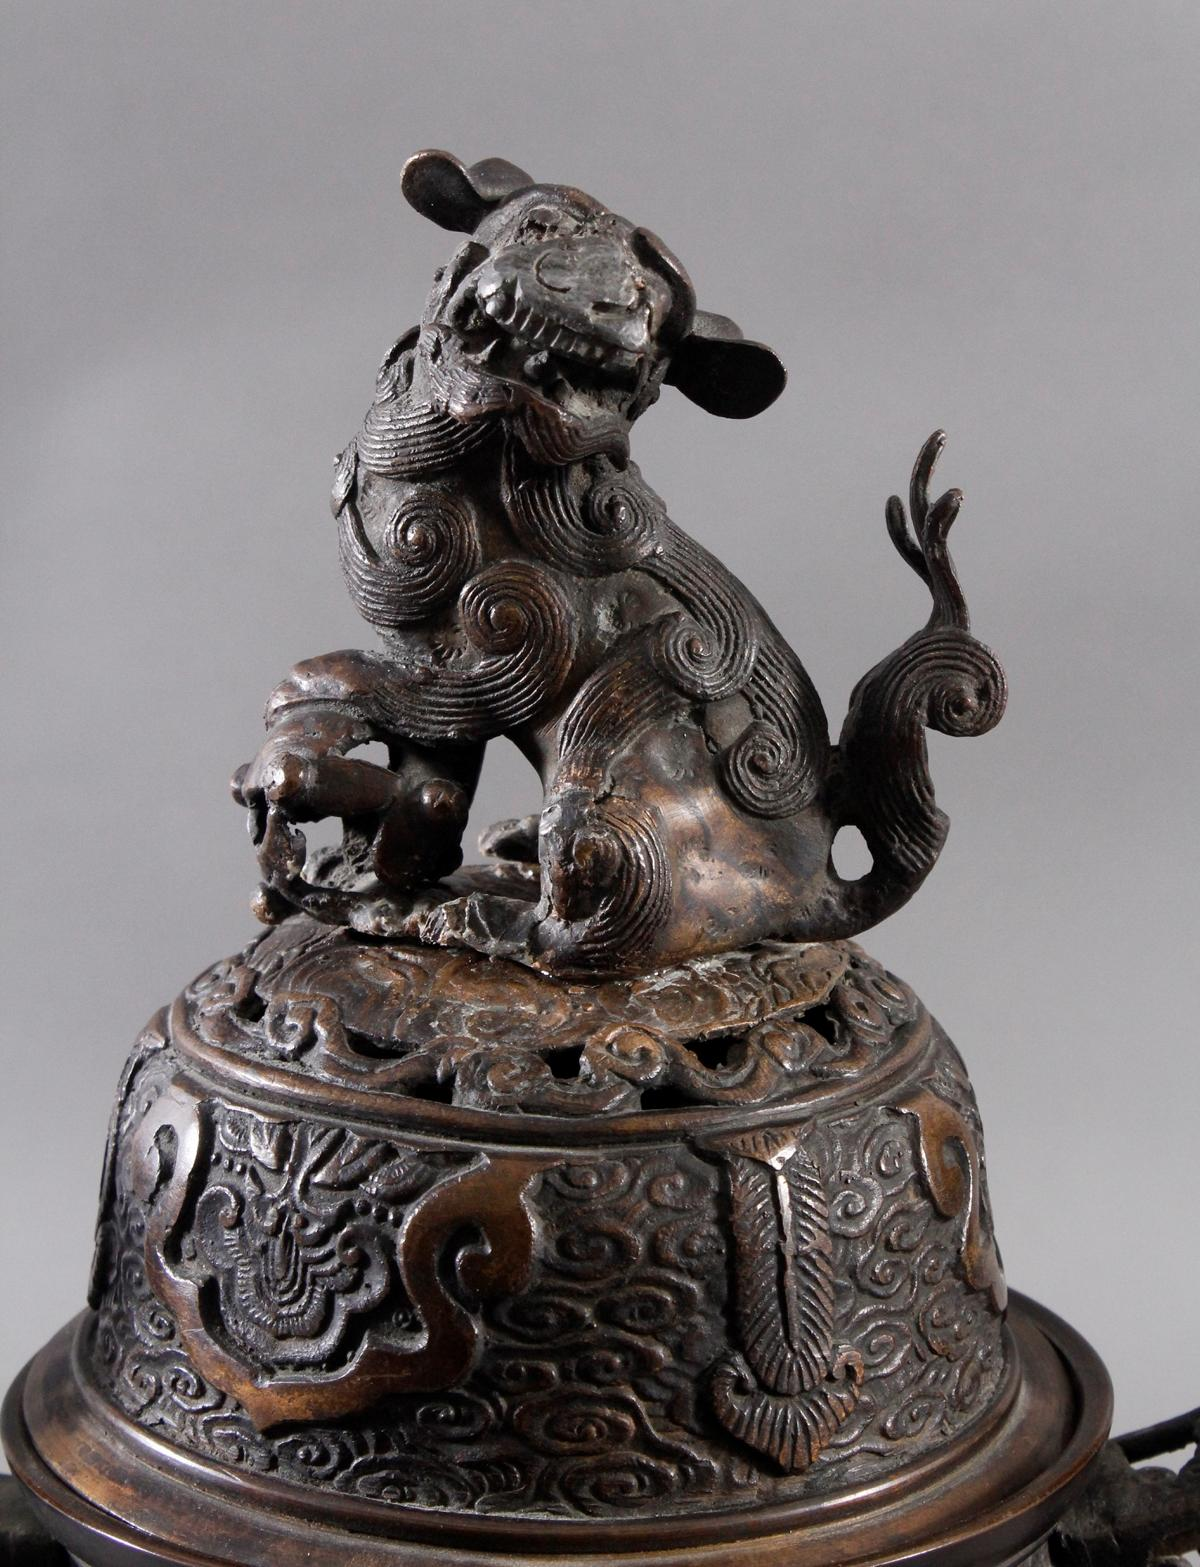 Großer Räucherkoro aus Bronze, China um 1900-2